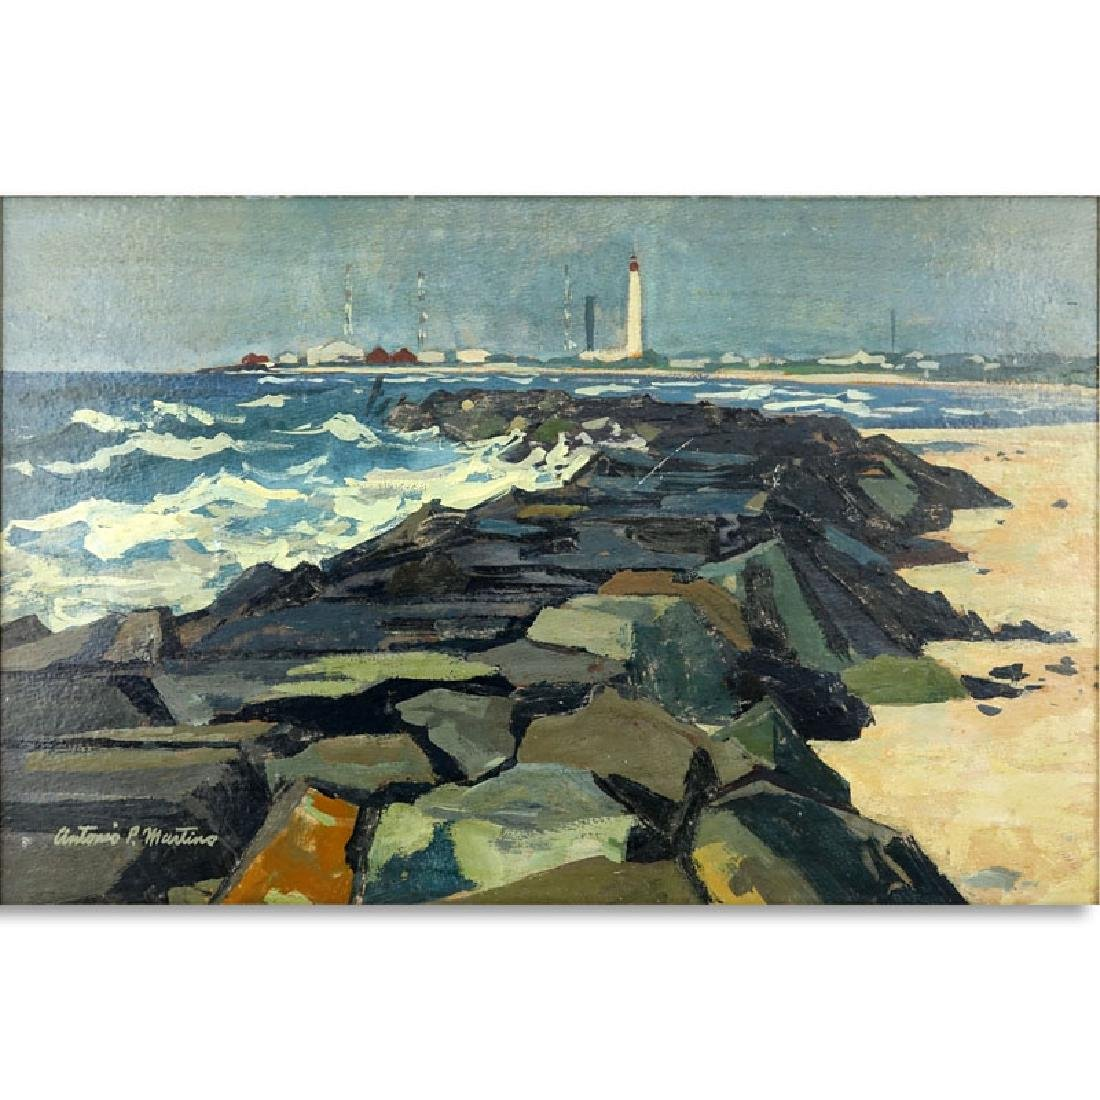 Antonio Pietro Martino, American (1902-1988) Oil on